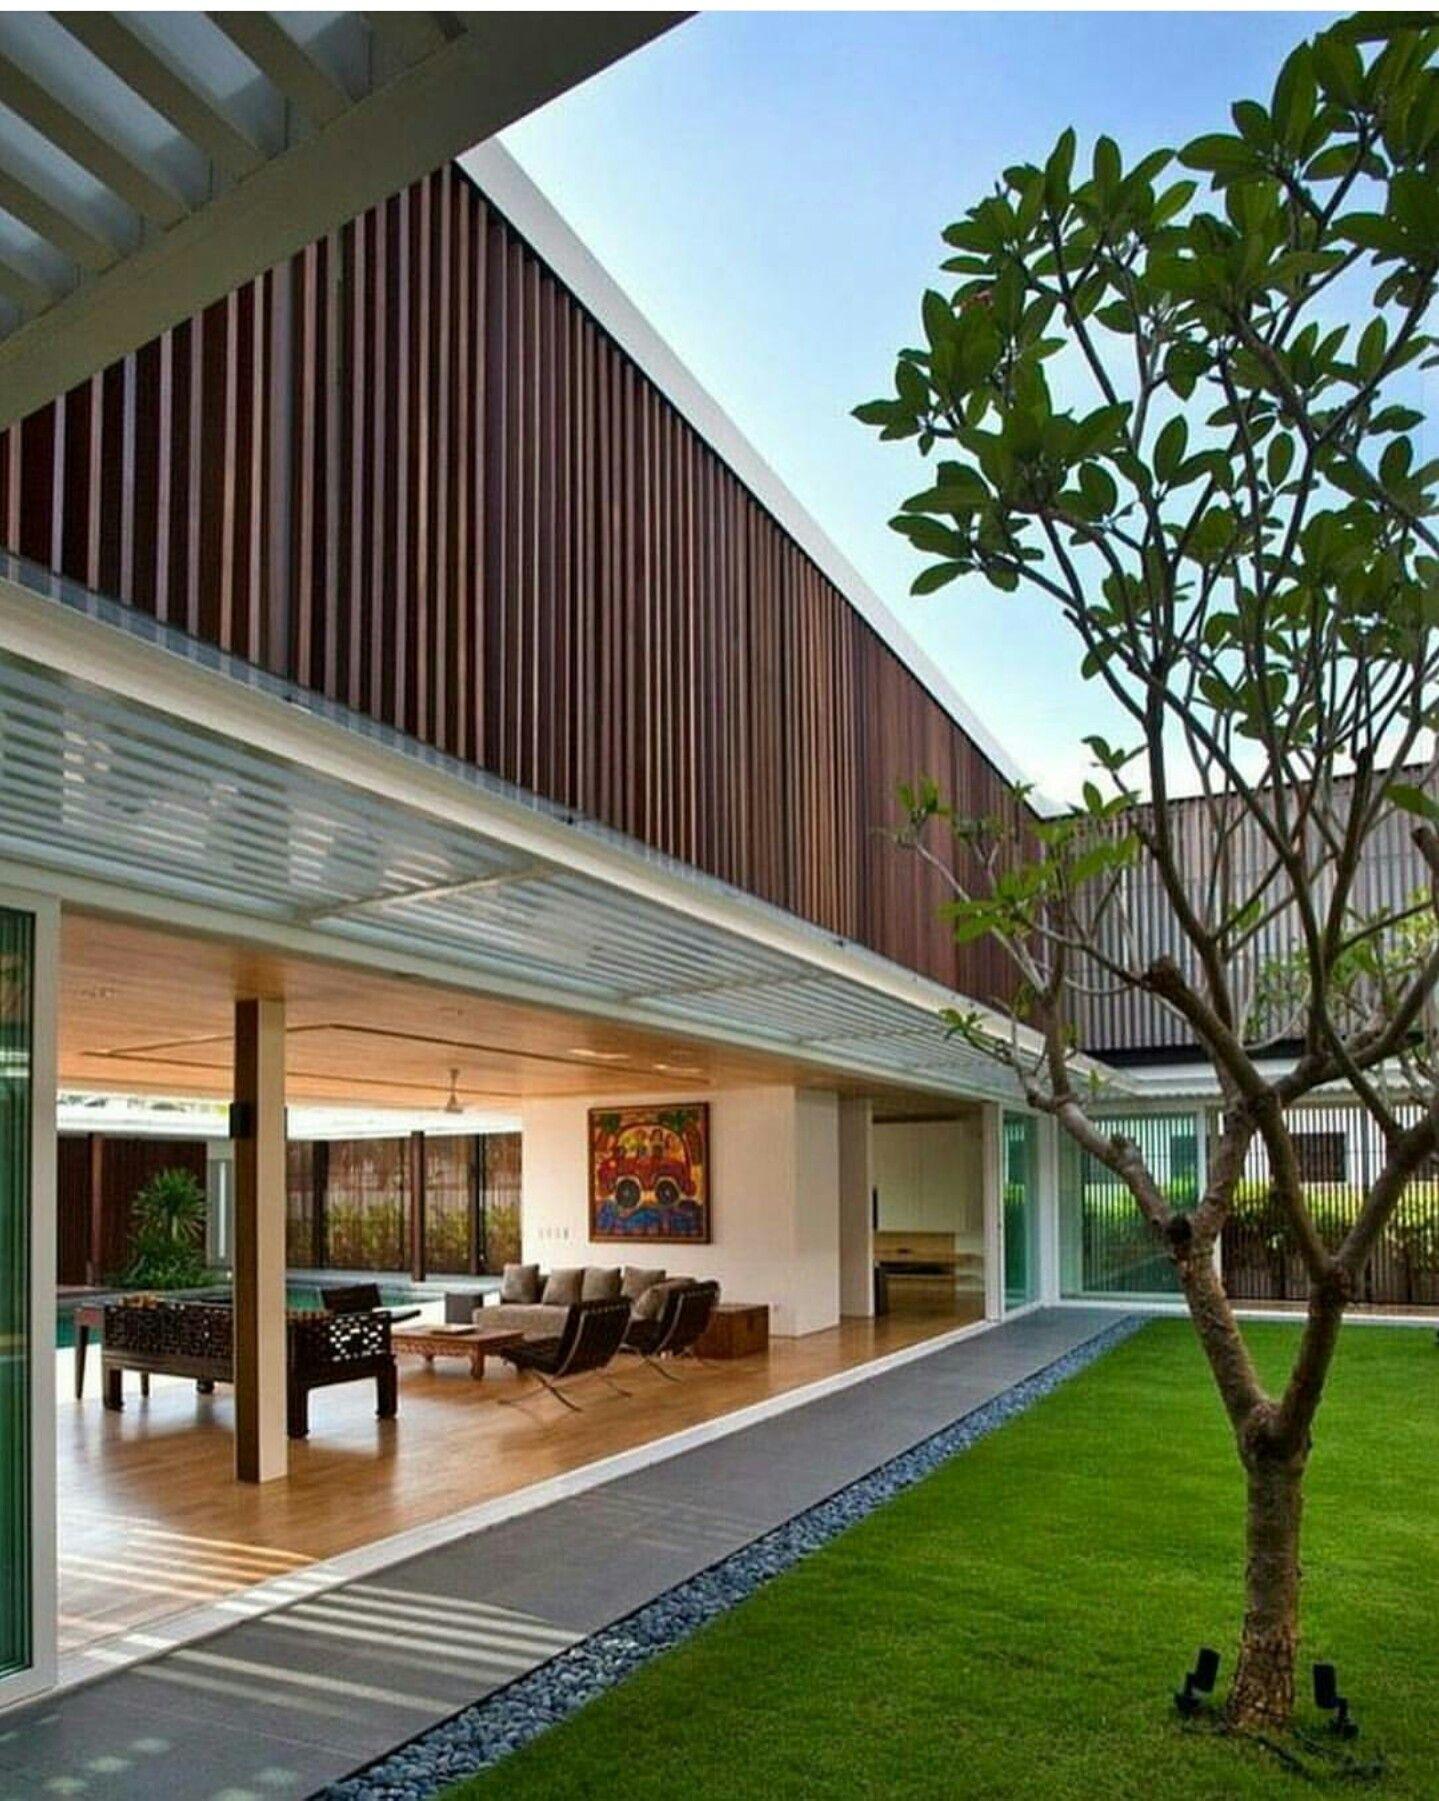 Explore Open House Architecture Design and more